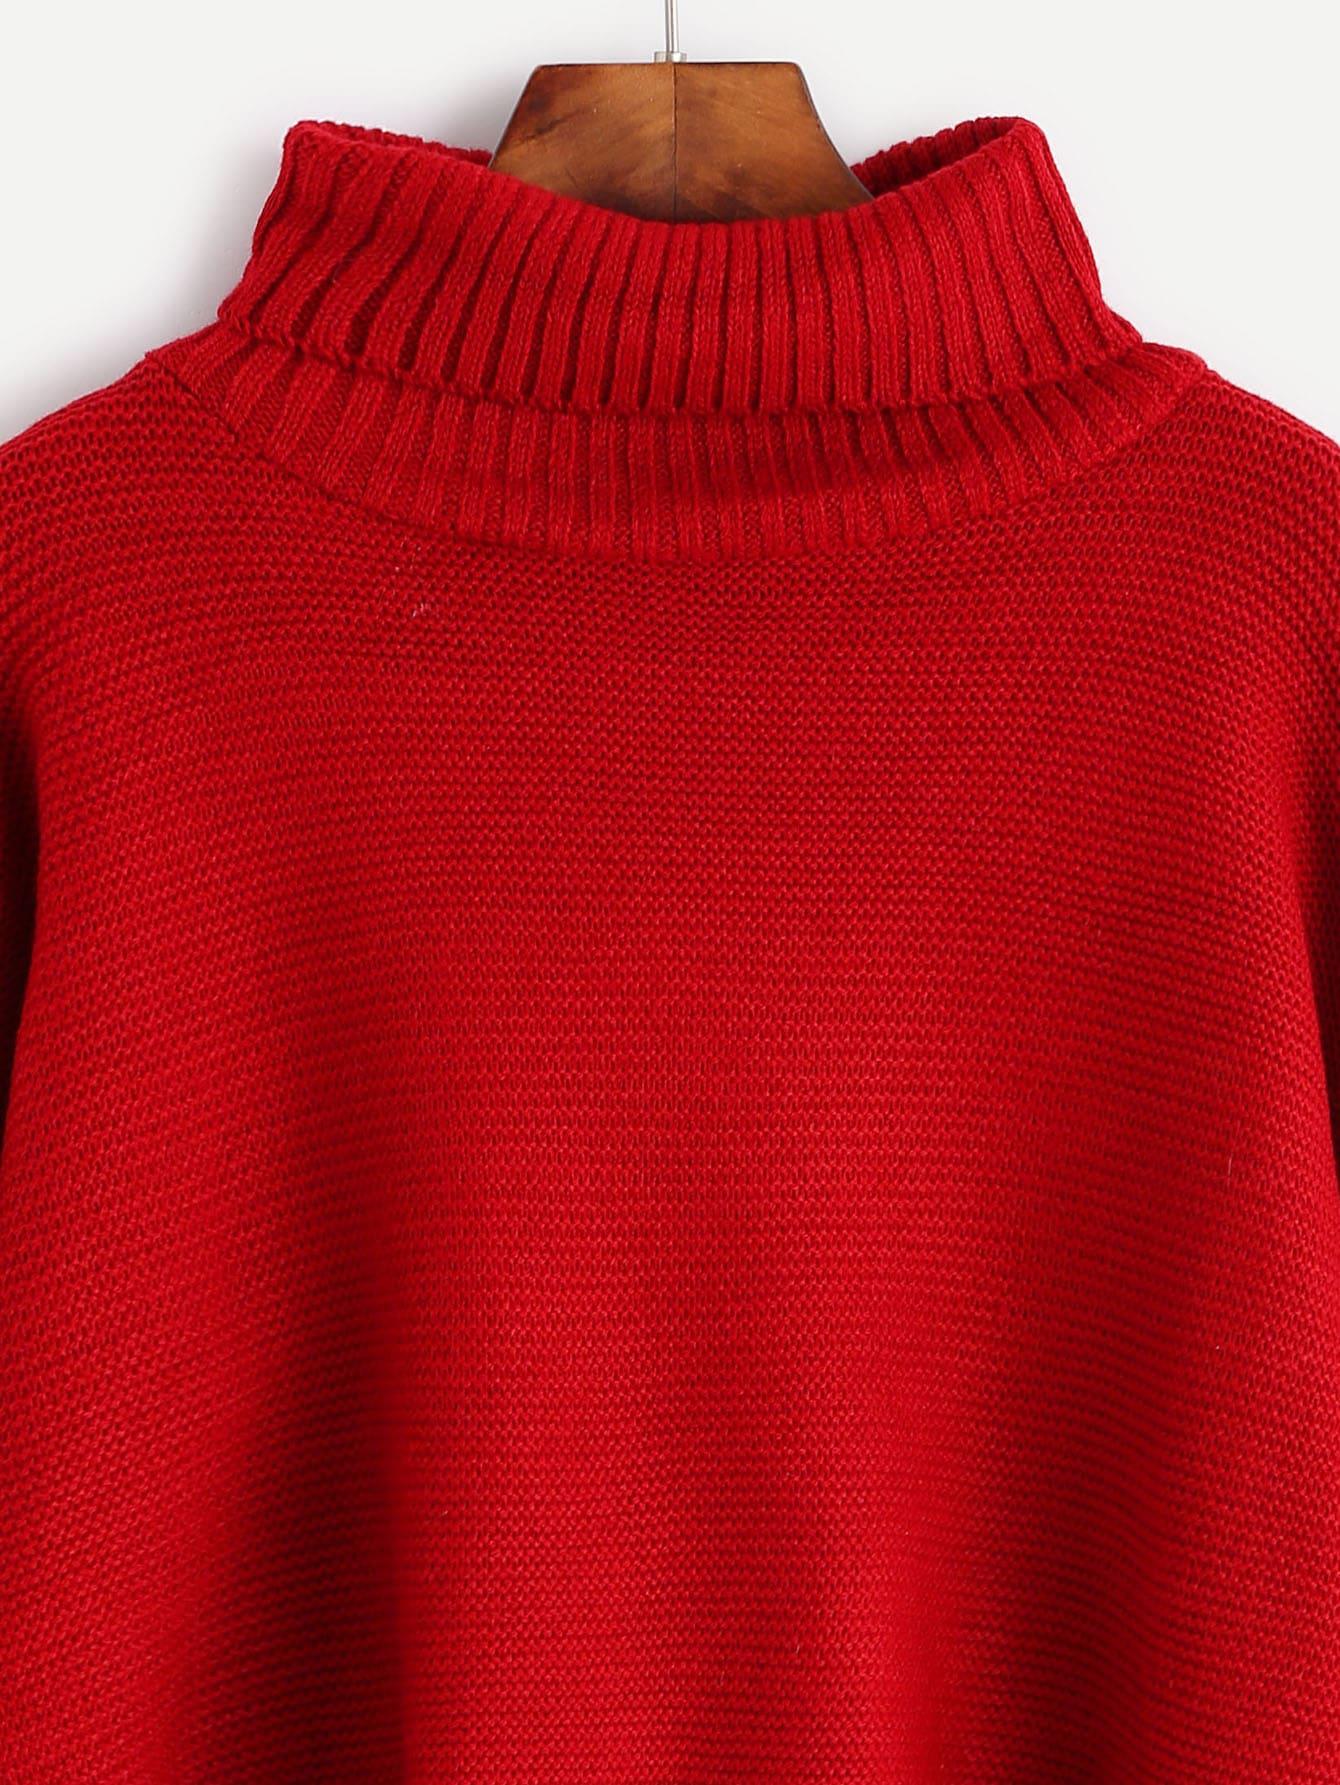 sweater161025135_2